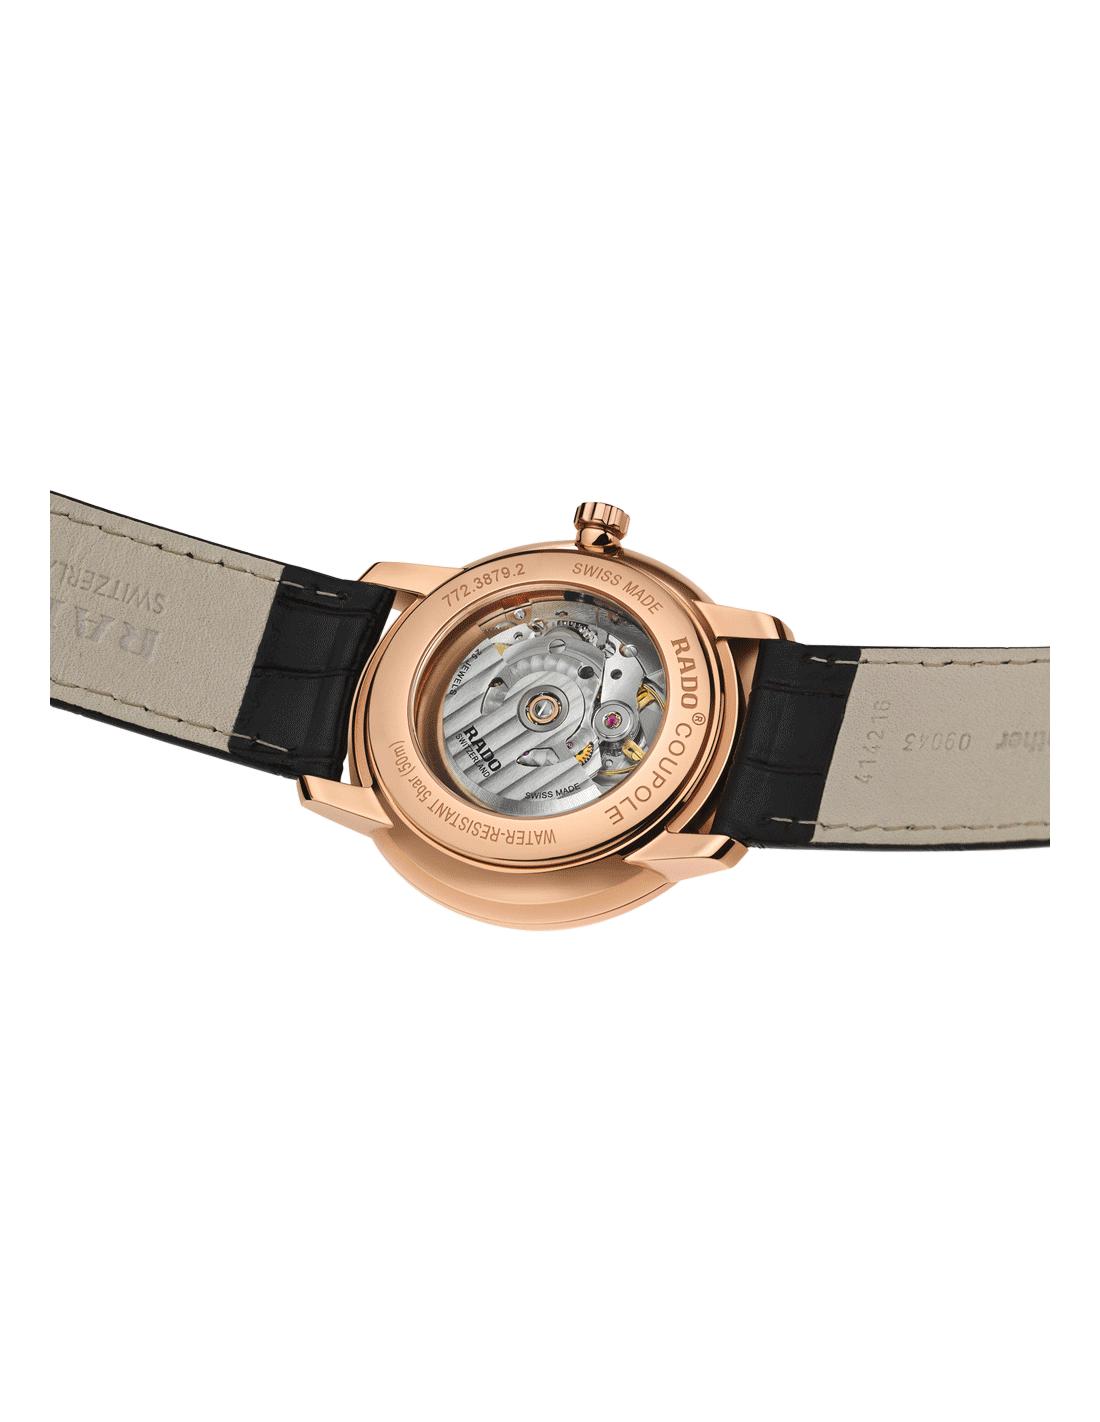 Rado - Horloge Heren - Coupole Classic - R22879205-2